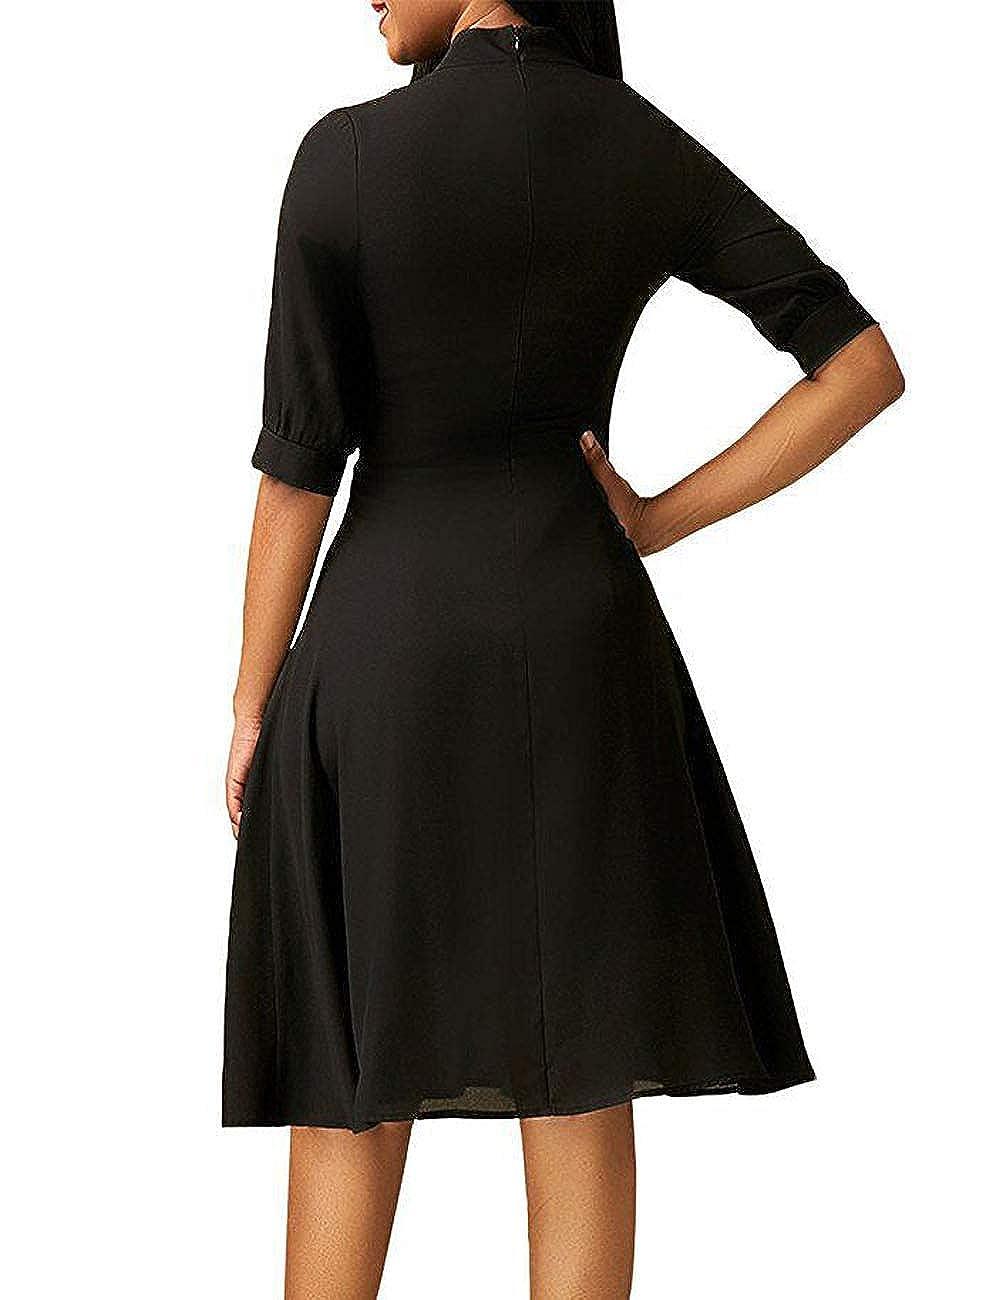 SUNNOE Womens Elegant Tie Neck Half Sleeve Pleated Swing Flare Dress